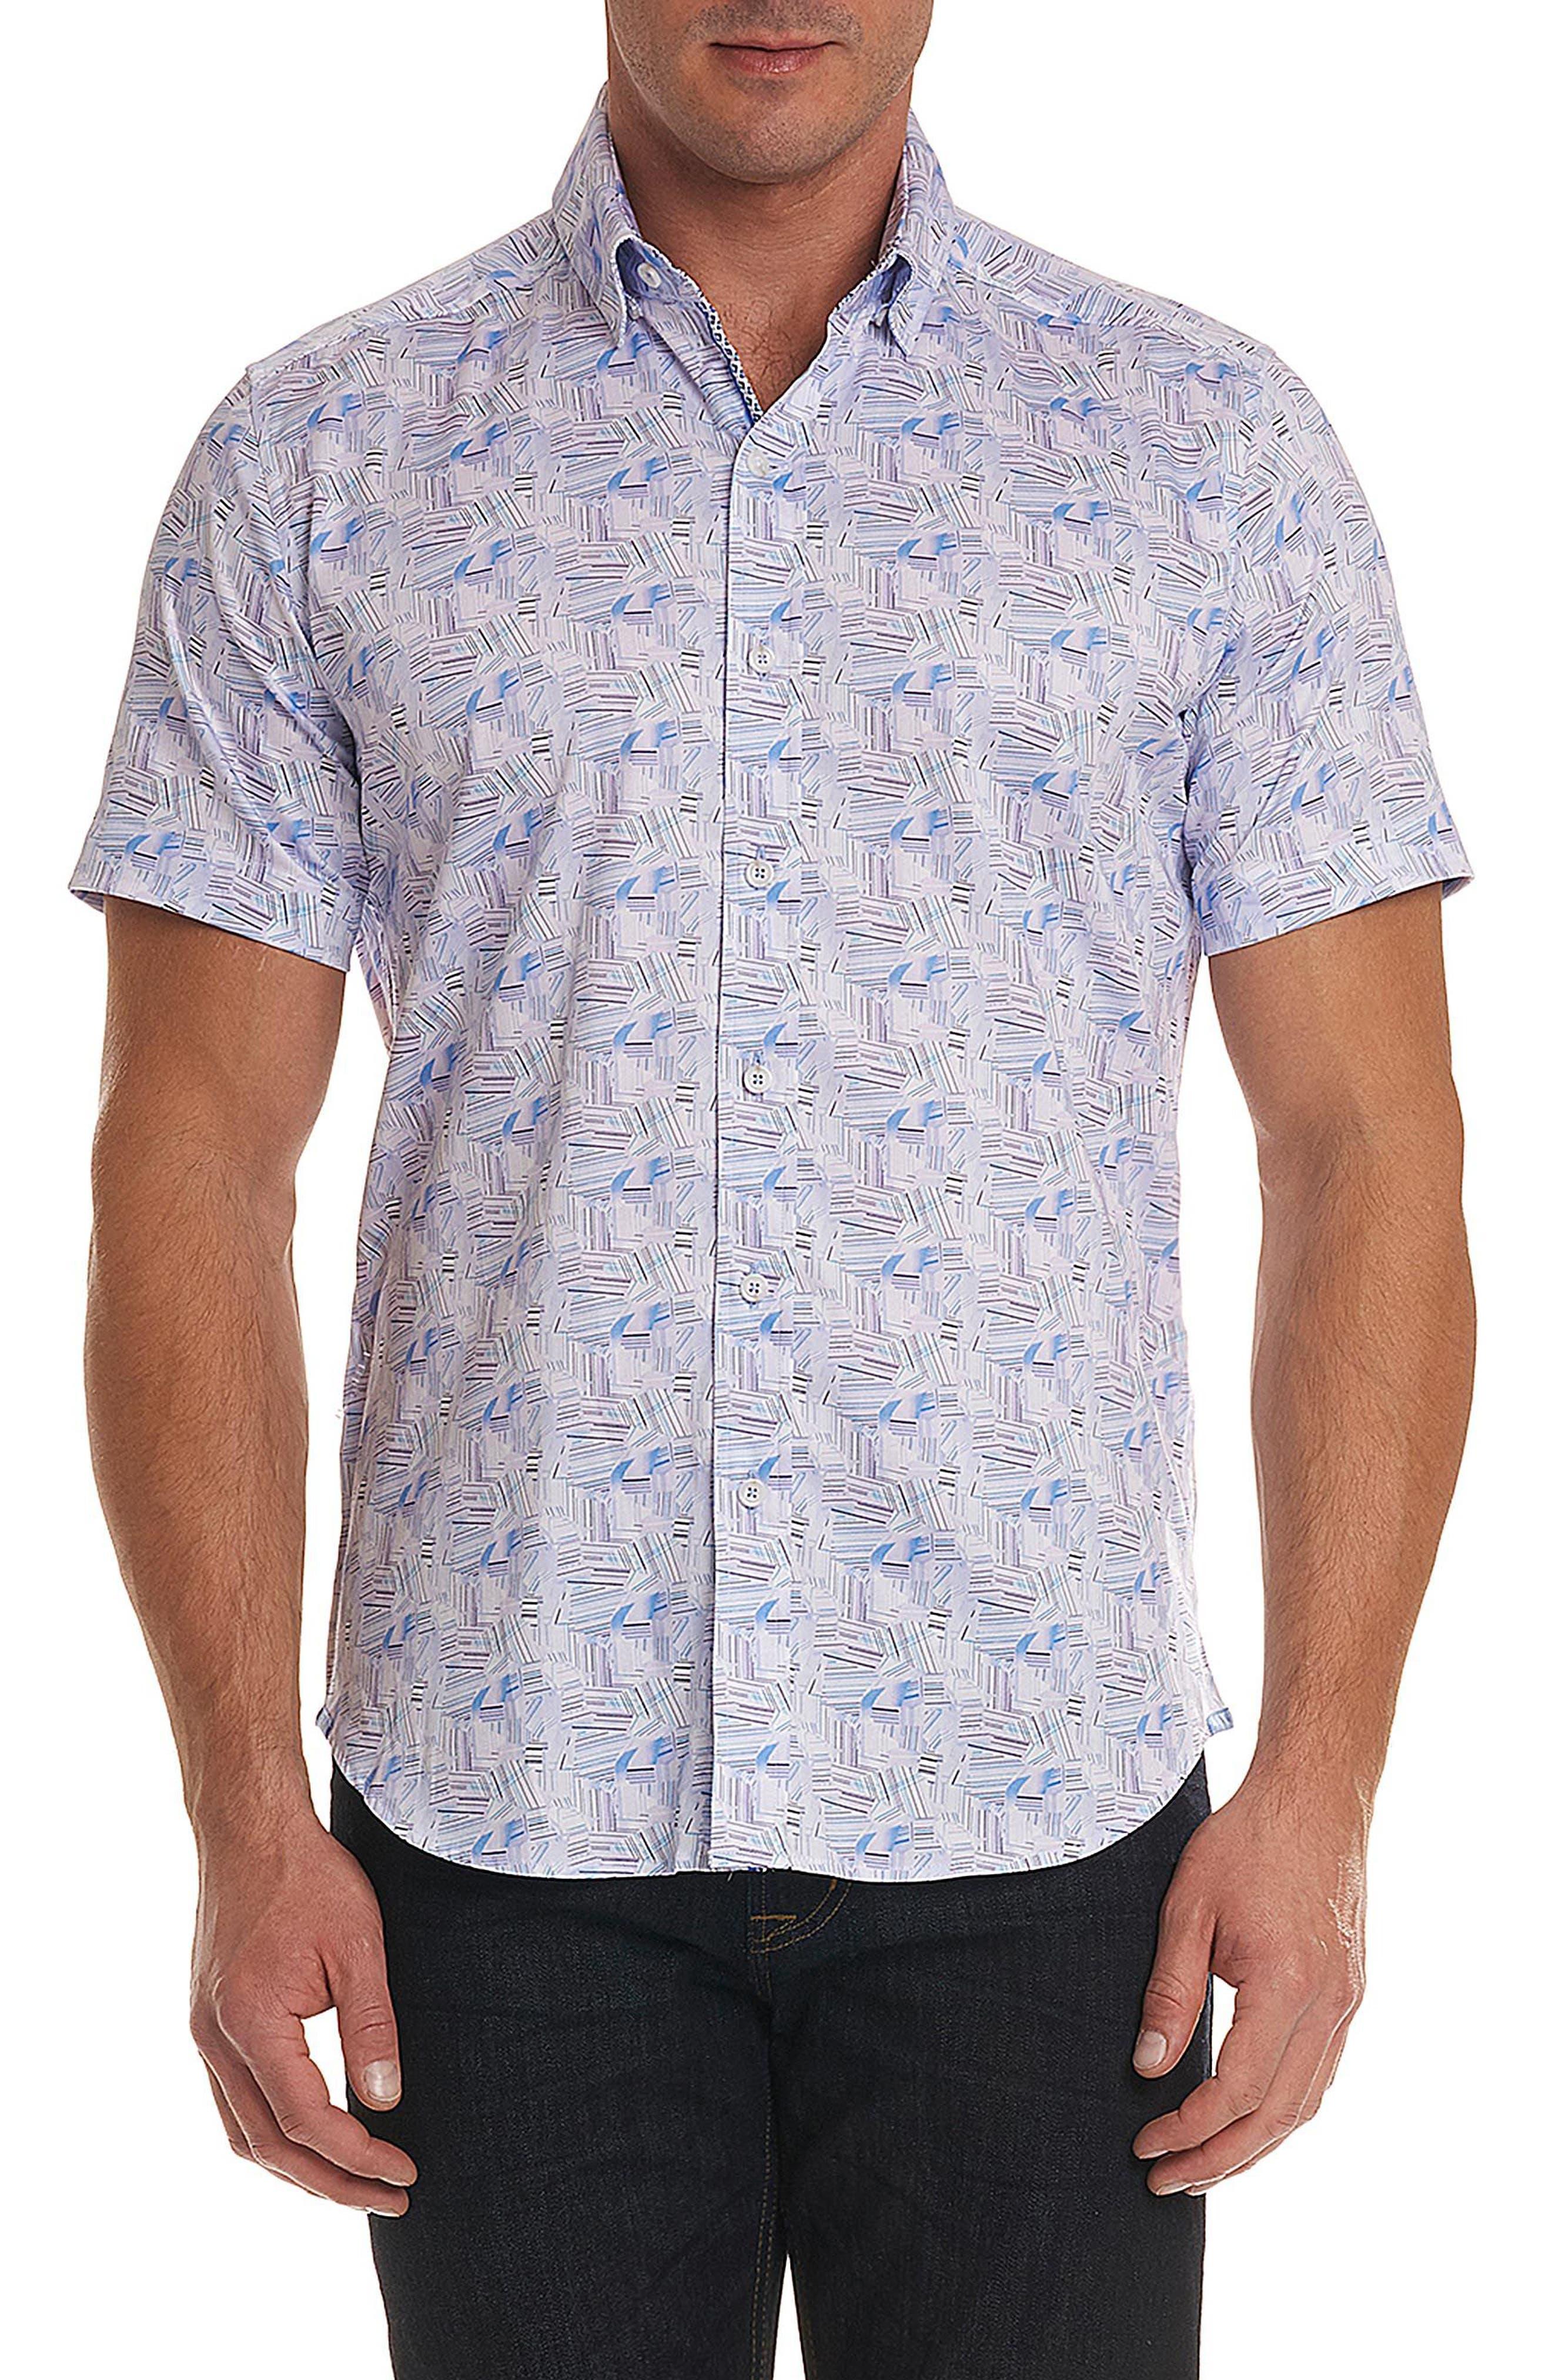 Cheap Shop Offer Robert Graham Gilby Print Sport Shirt Clearance High Quality ANWGU7